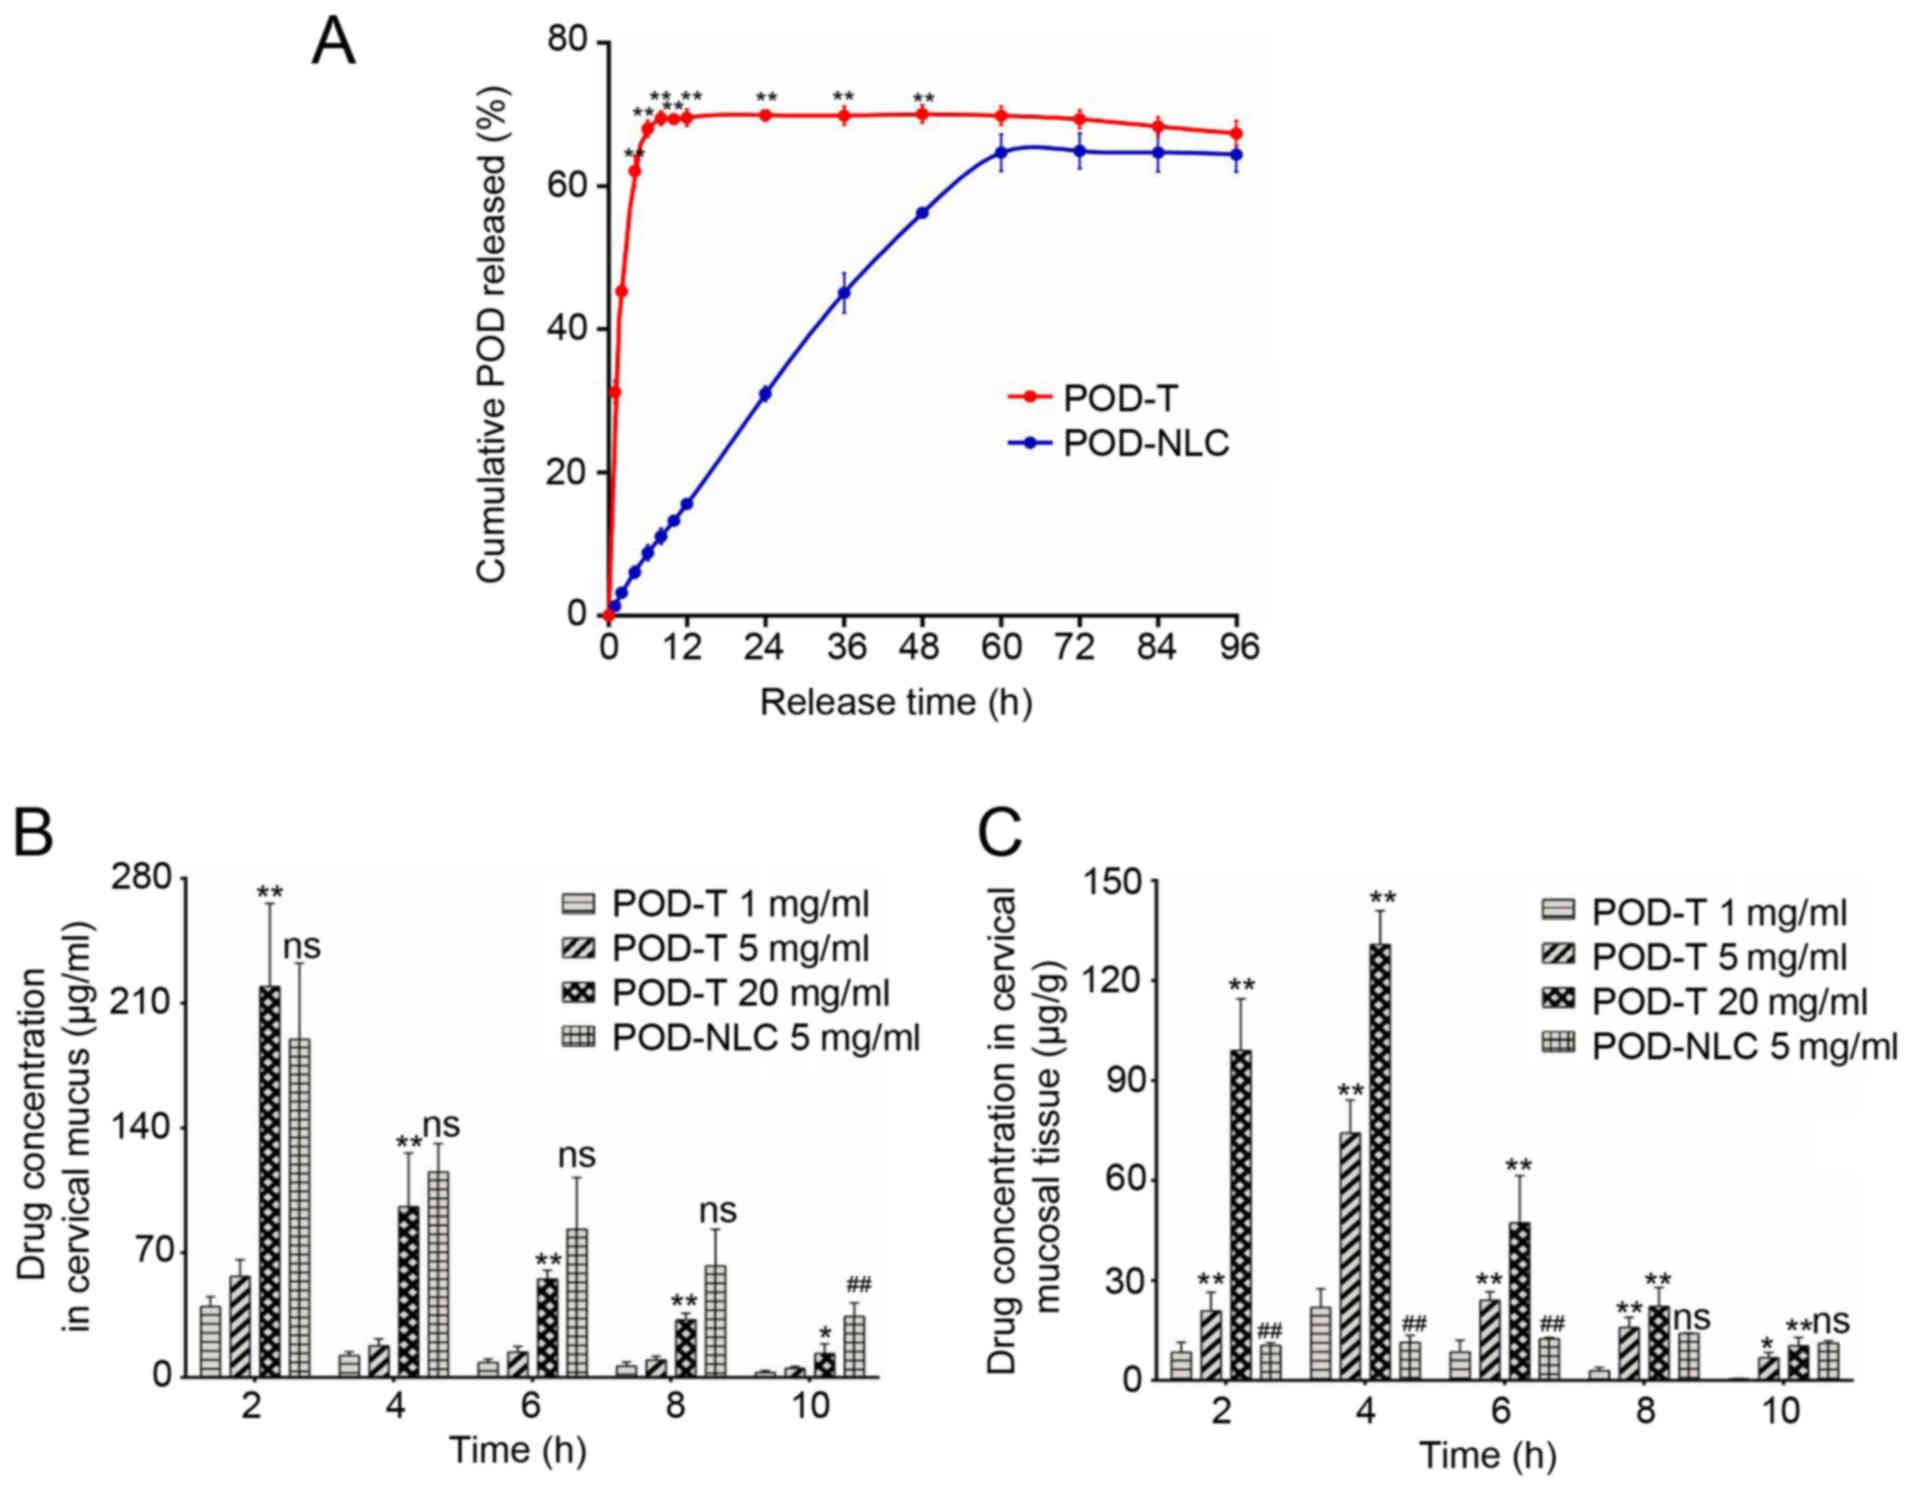 Development of podophyllotoxin‑loaded nanostructured lipid